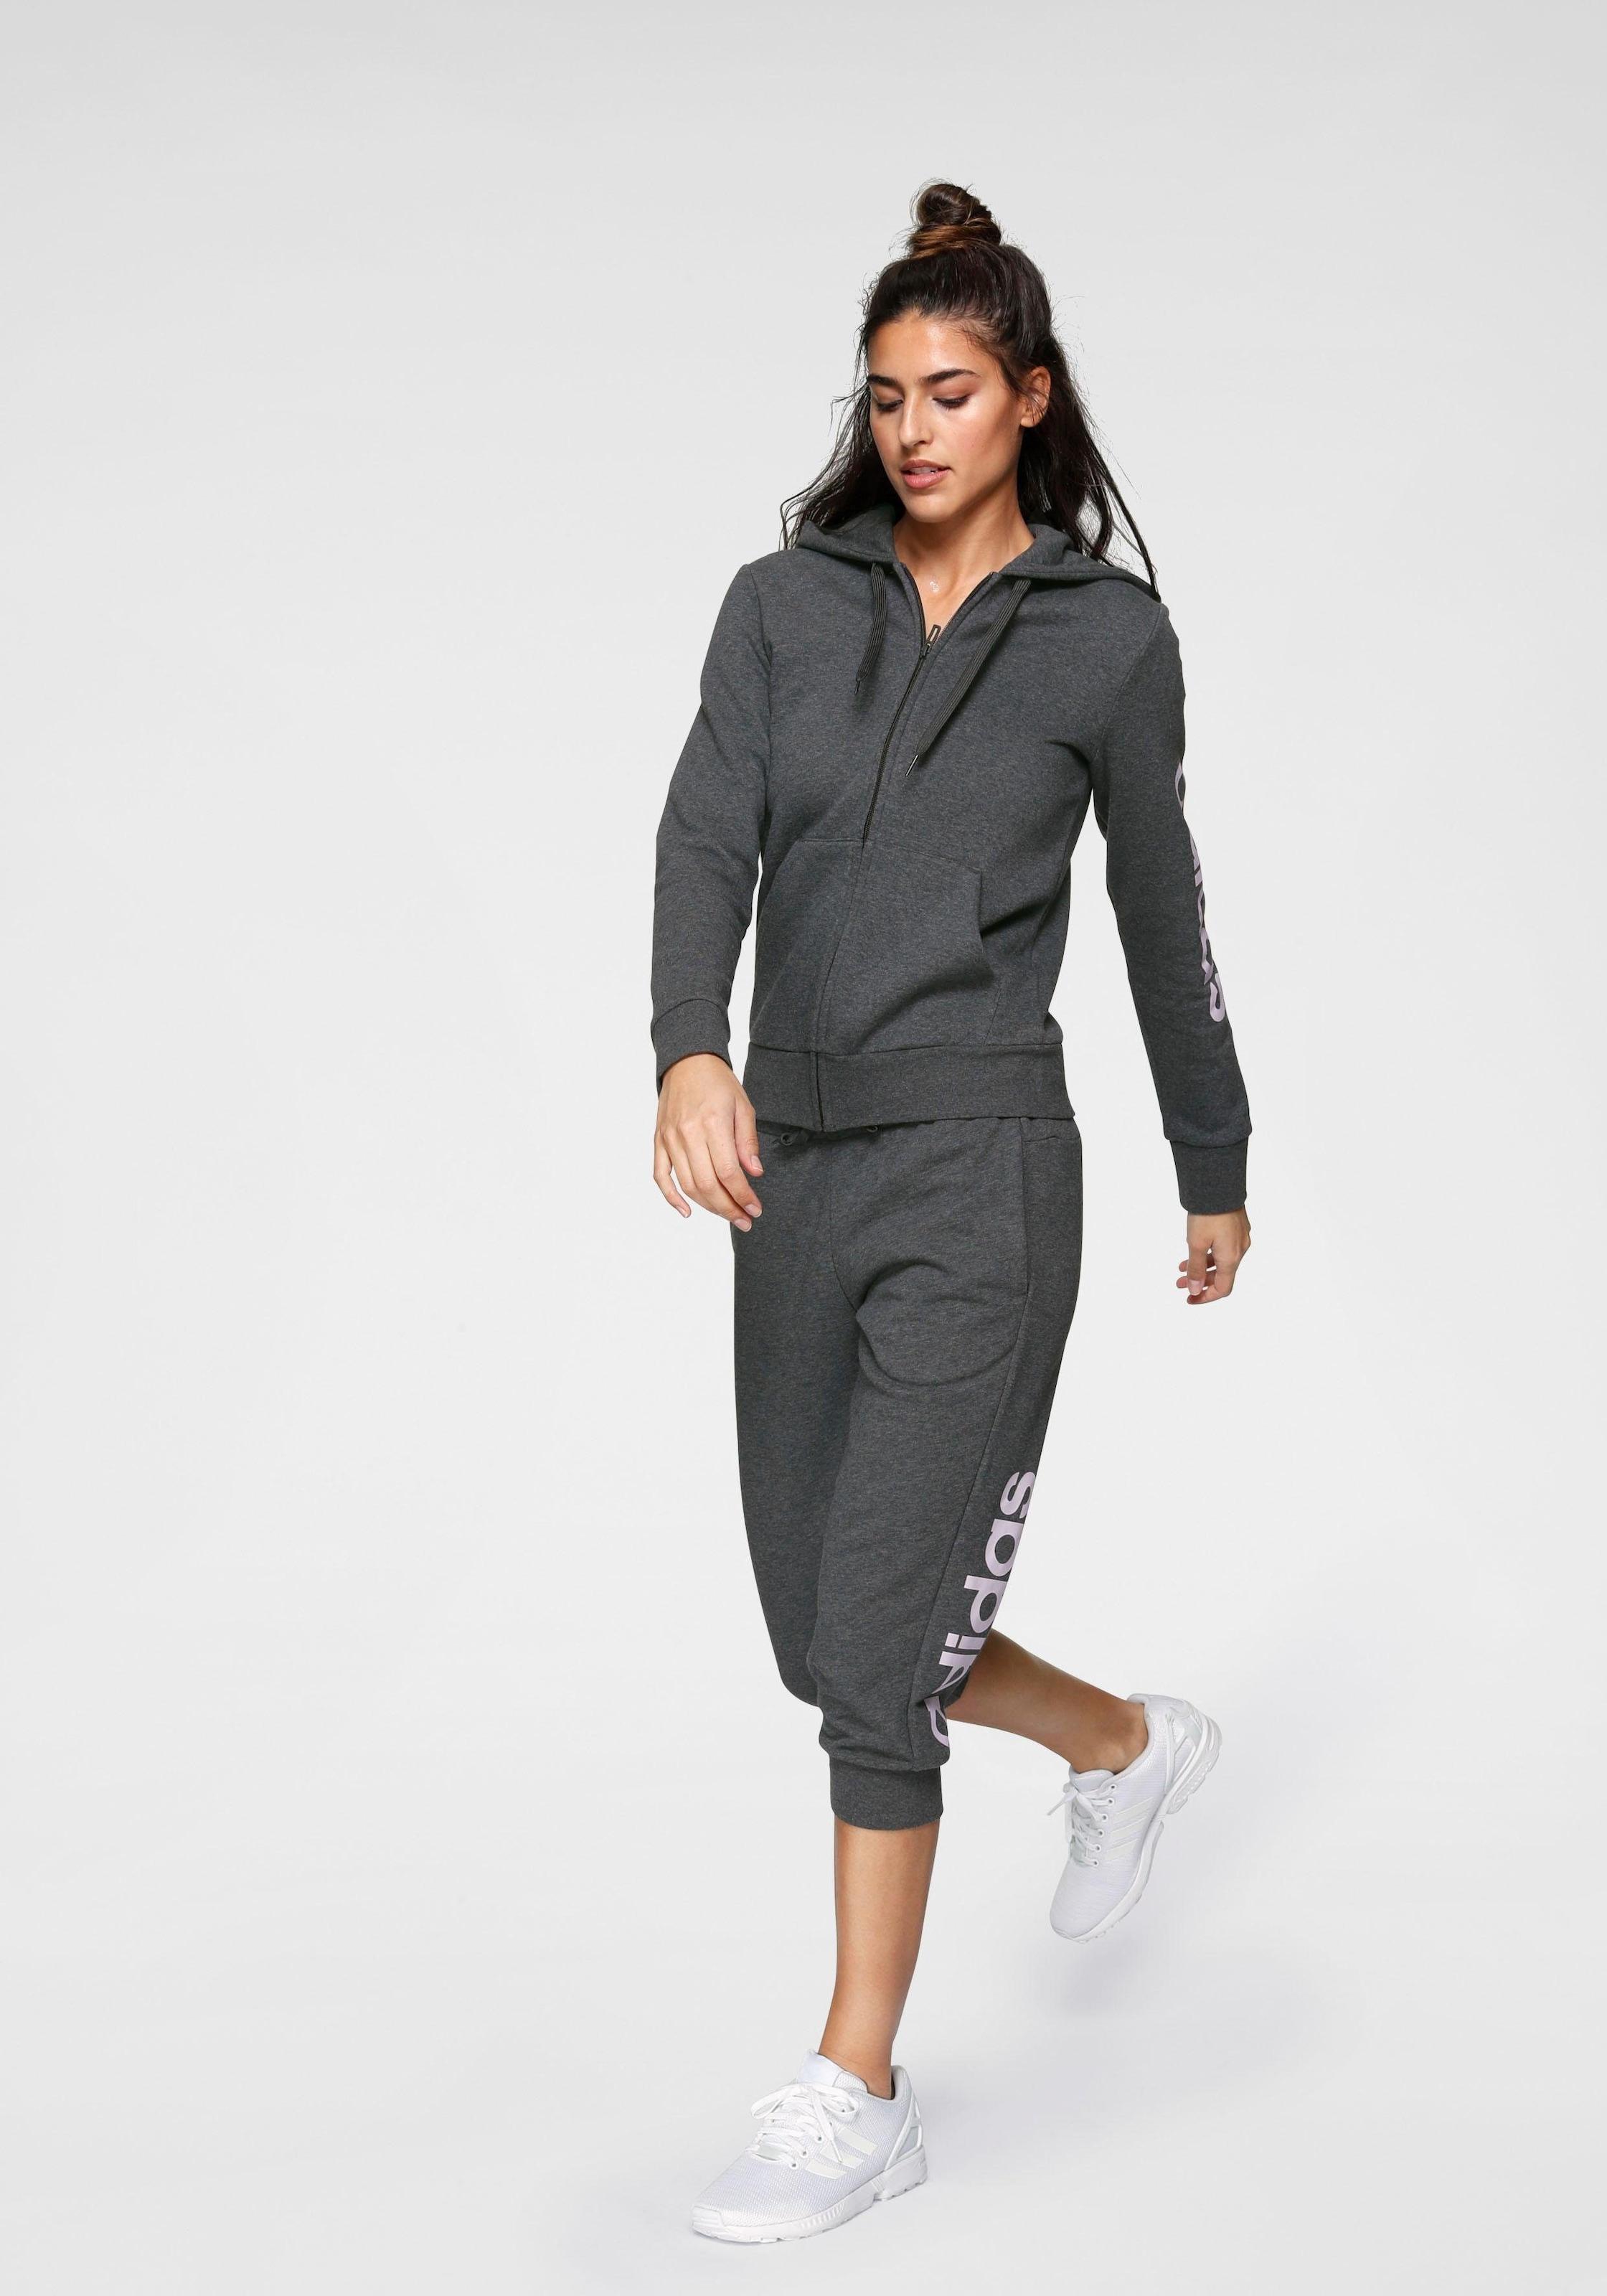 adidas performance kapuzensweatjacke essentials linear full zip hoody Kapuzensweatjacke von adidas CORE SPORT AKLBB883397969